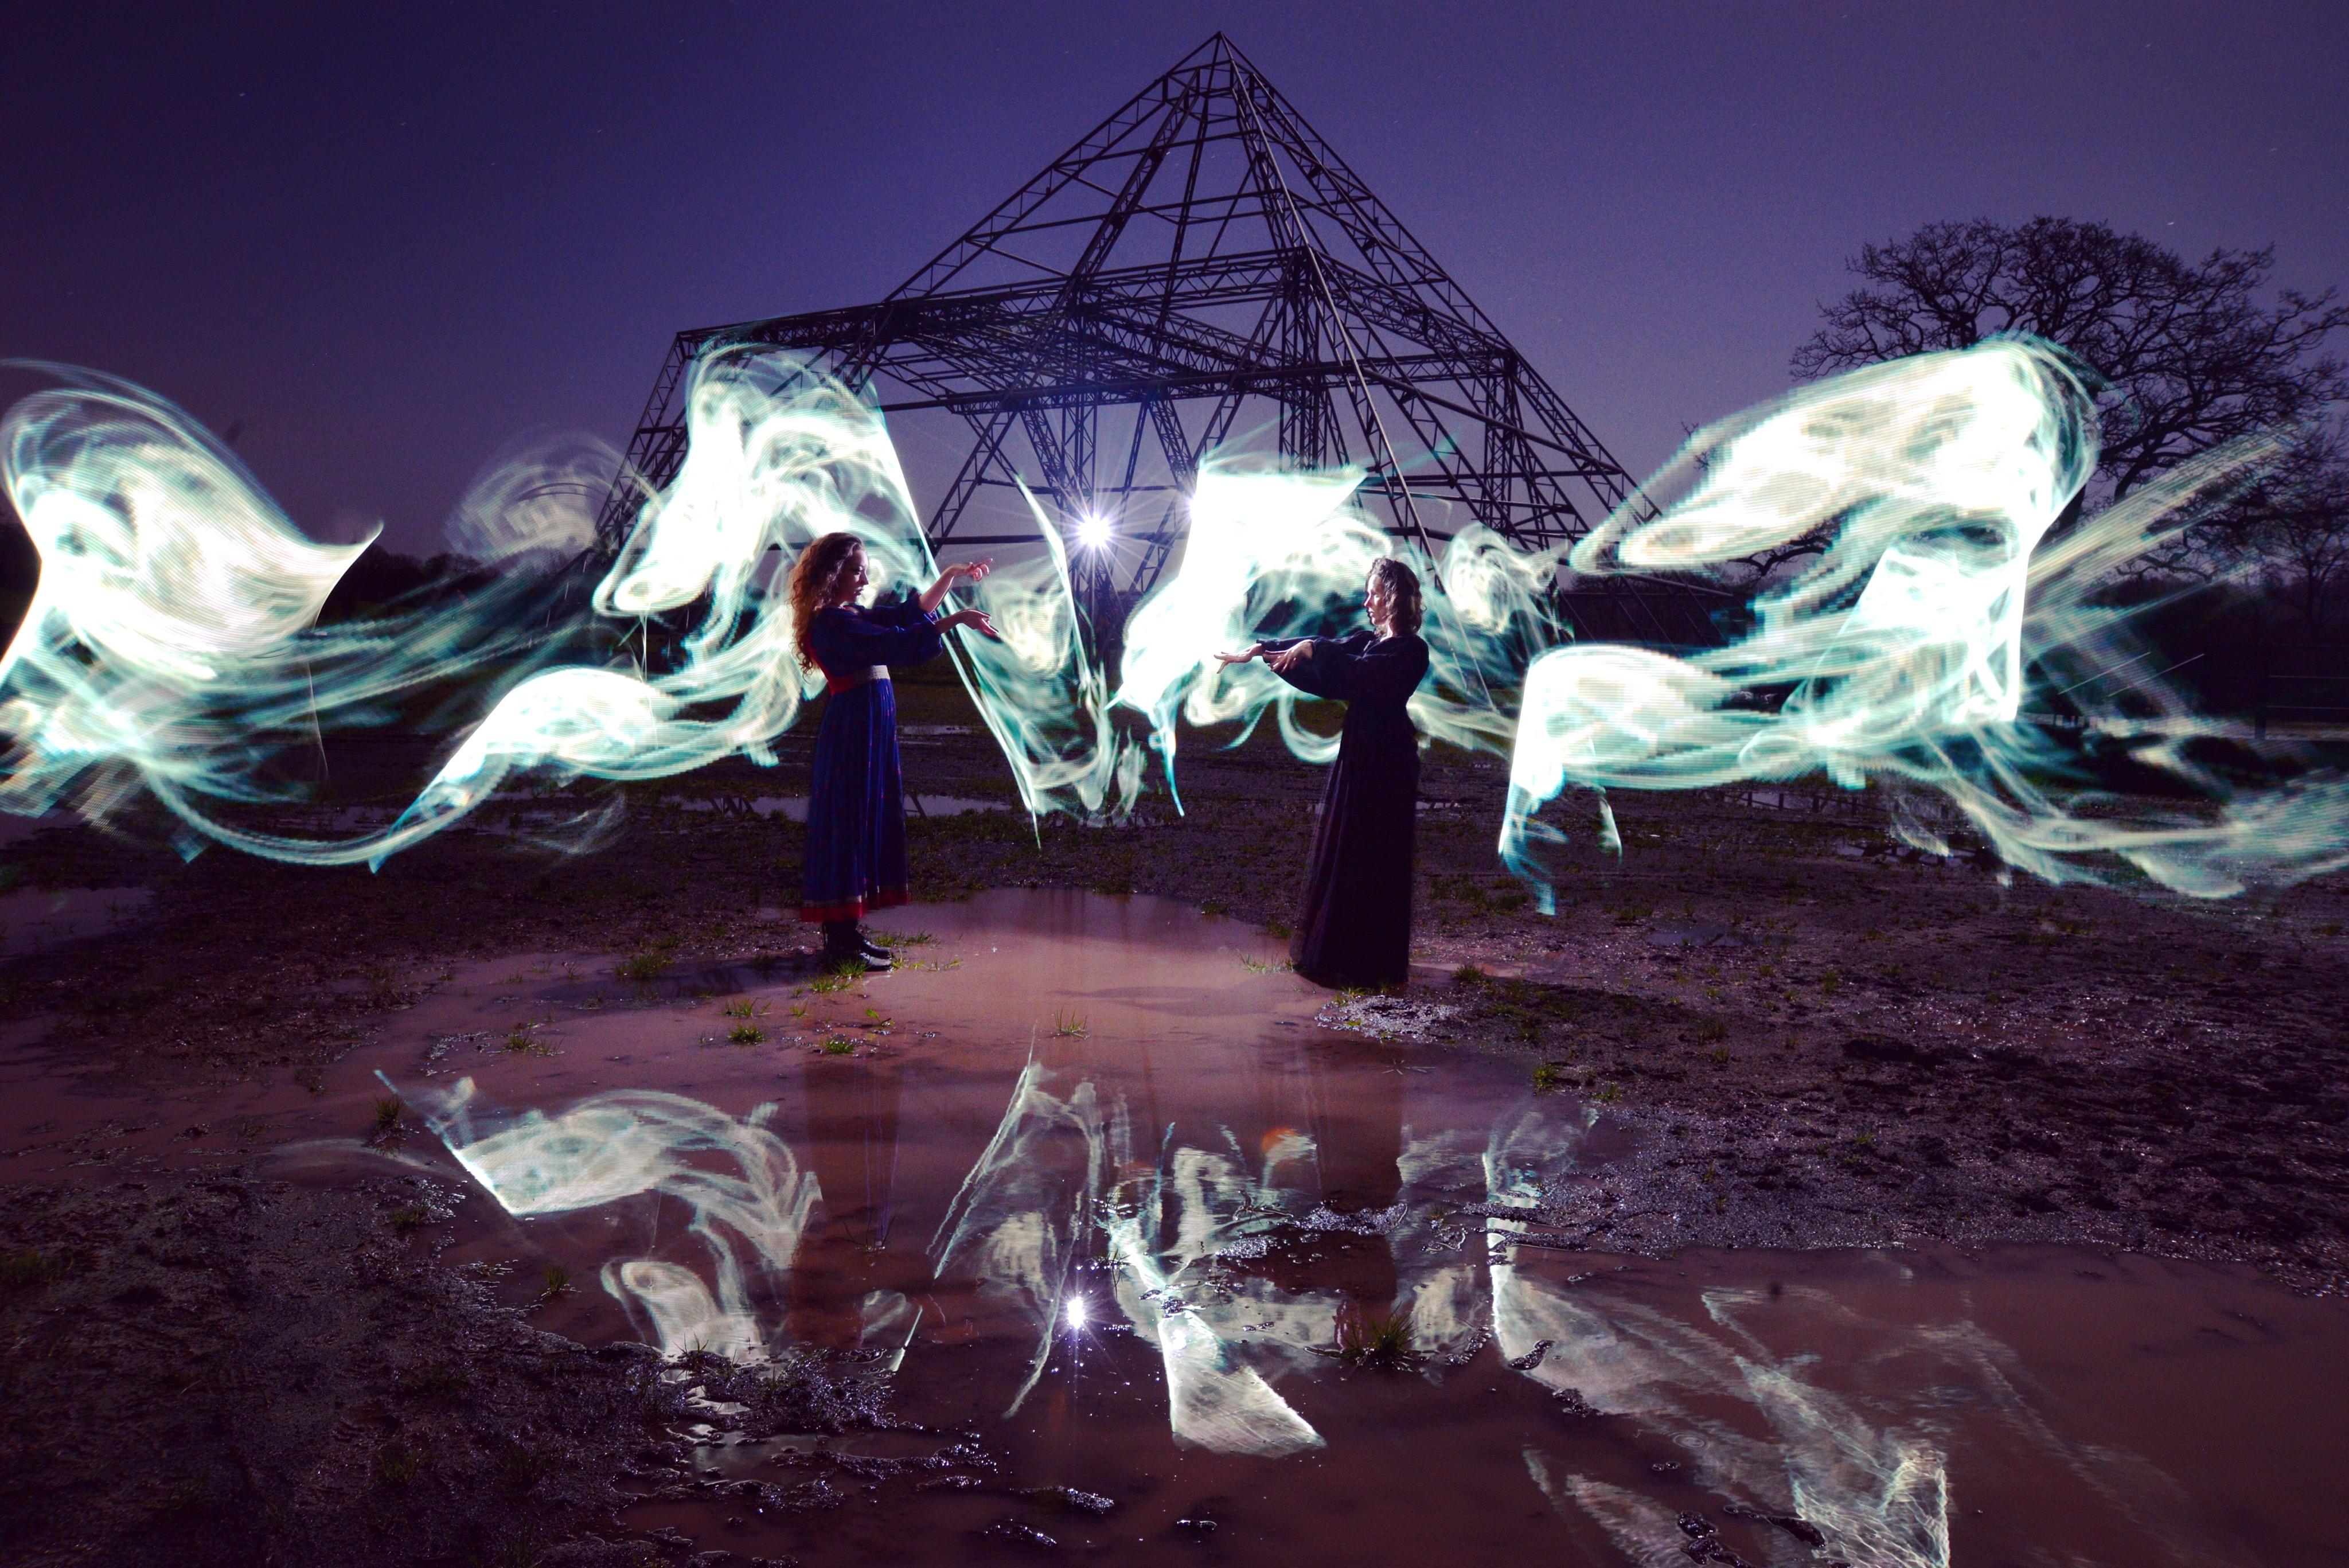 Pyramid stage worthy farm glastonbury festival magic pixelstick